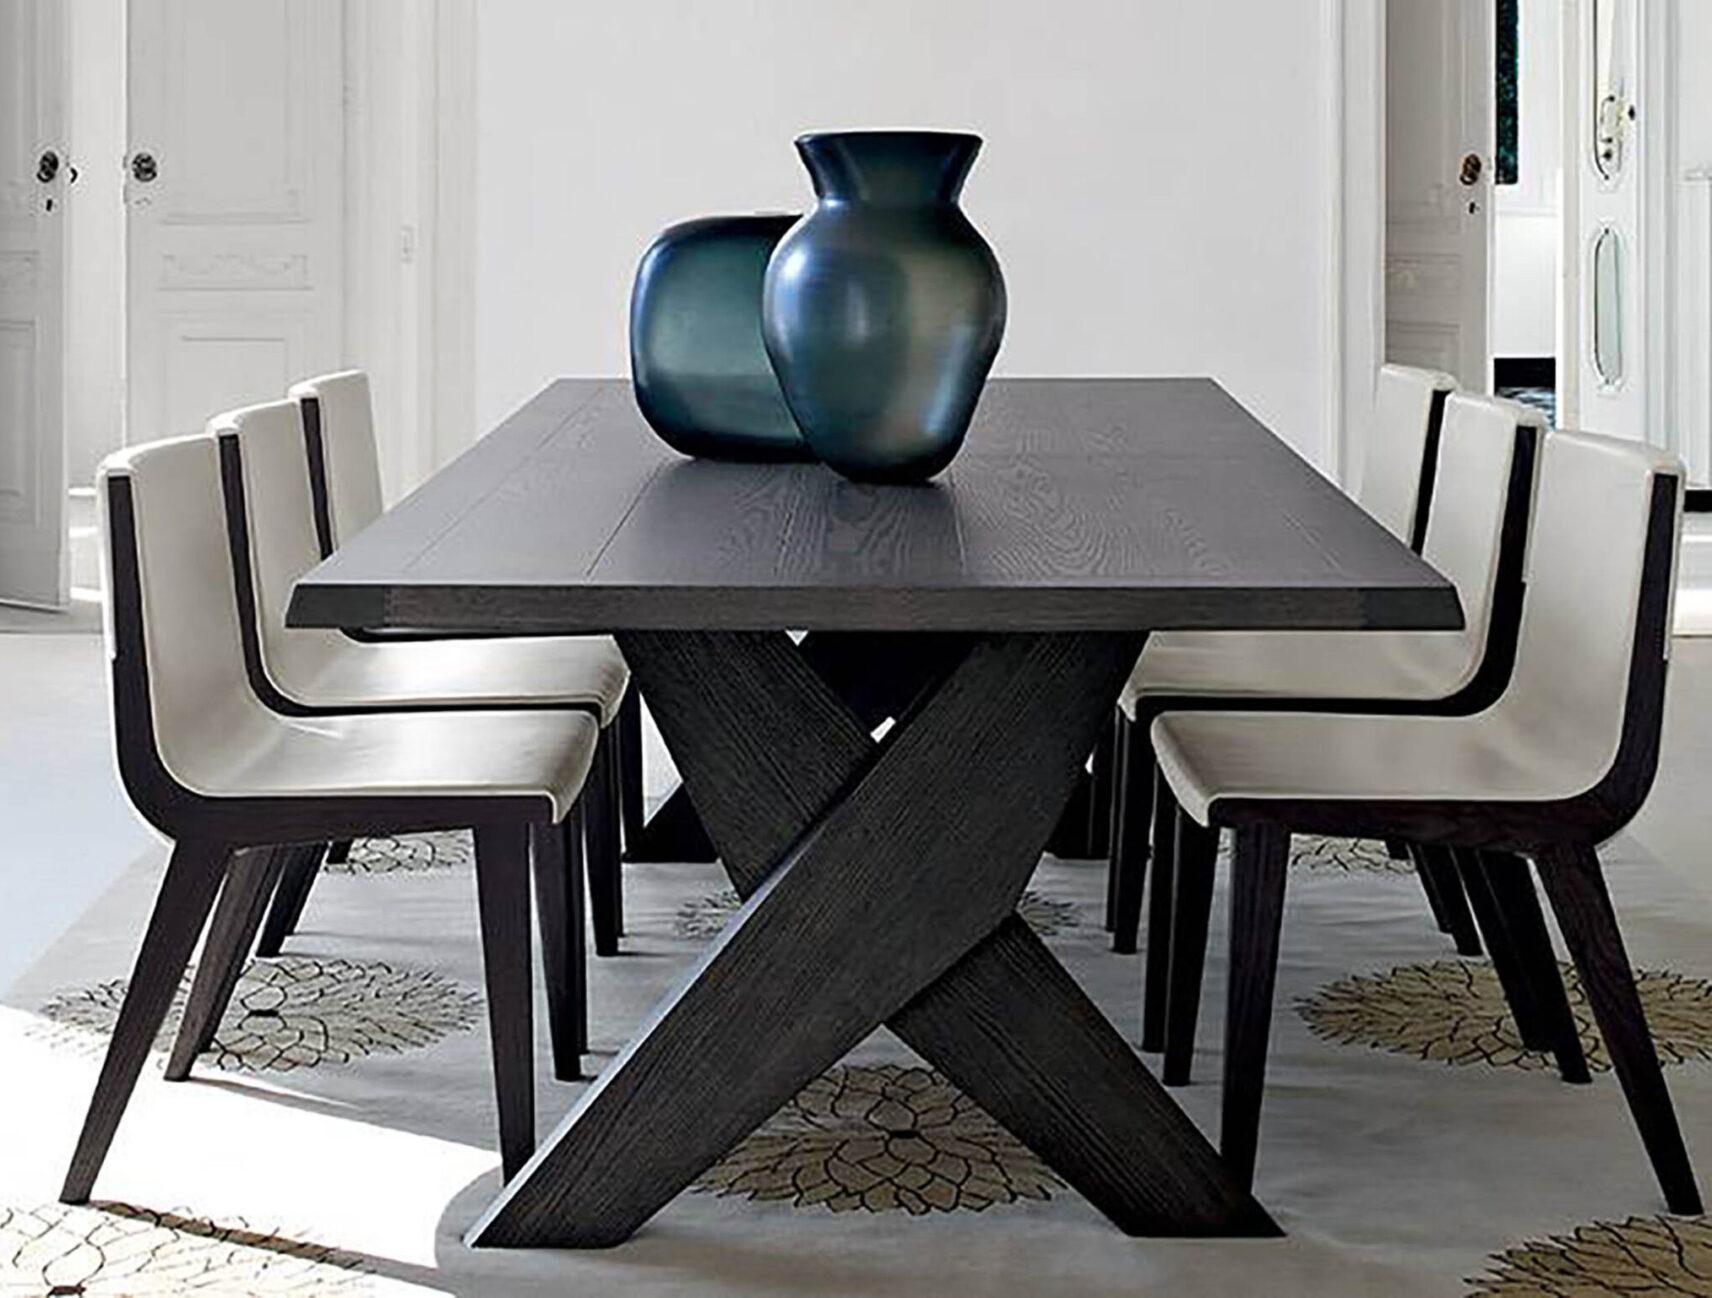 Tisch Ares Der Acro Collection Von Maxalto